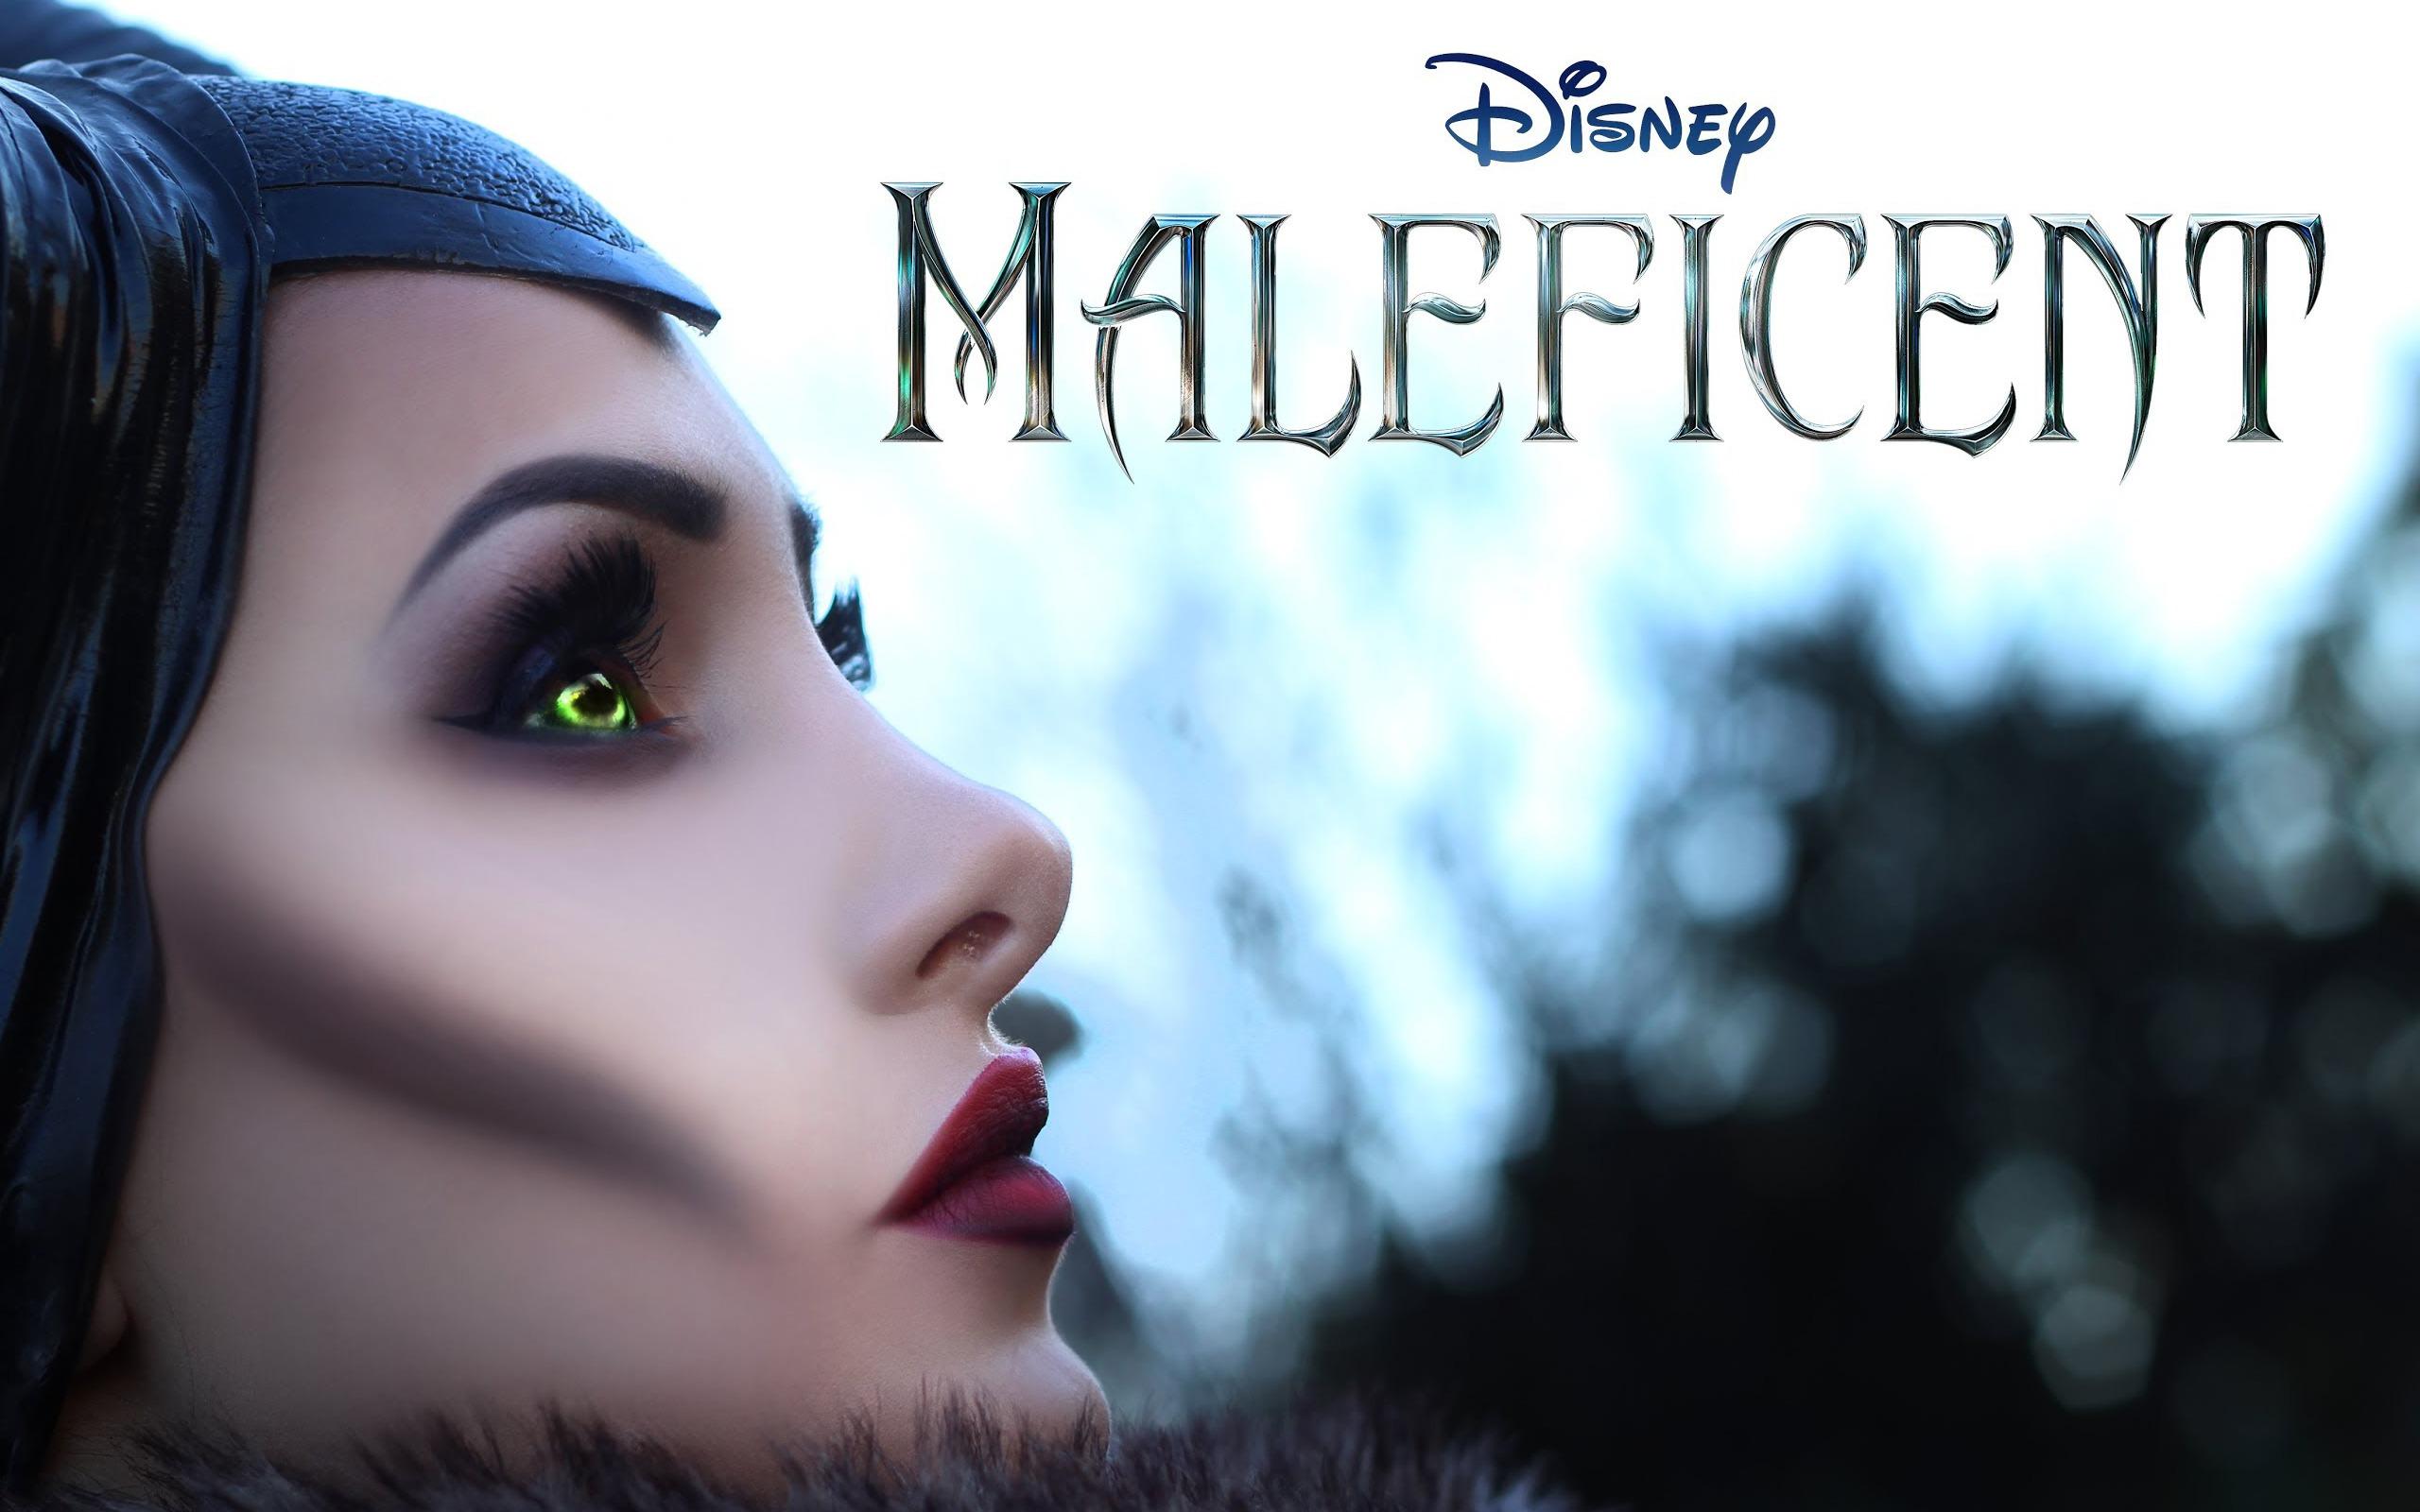 Maleficent Movie 2014 Hd Ipad Iphone Wallpapers: Maleficent 2014映画のHD壁紙プレビュー